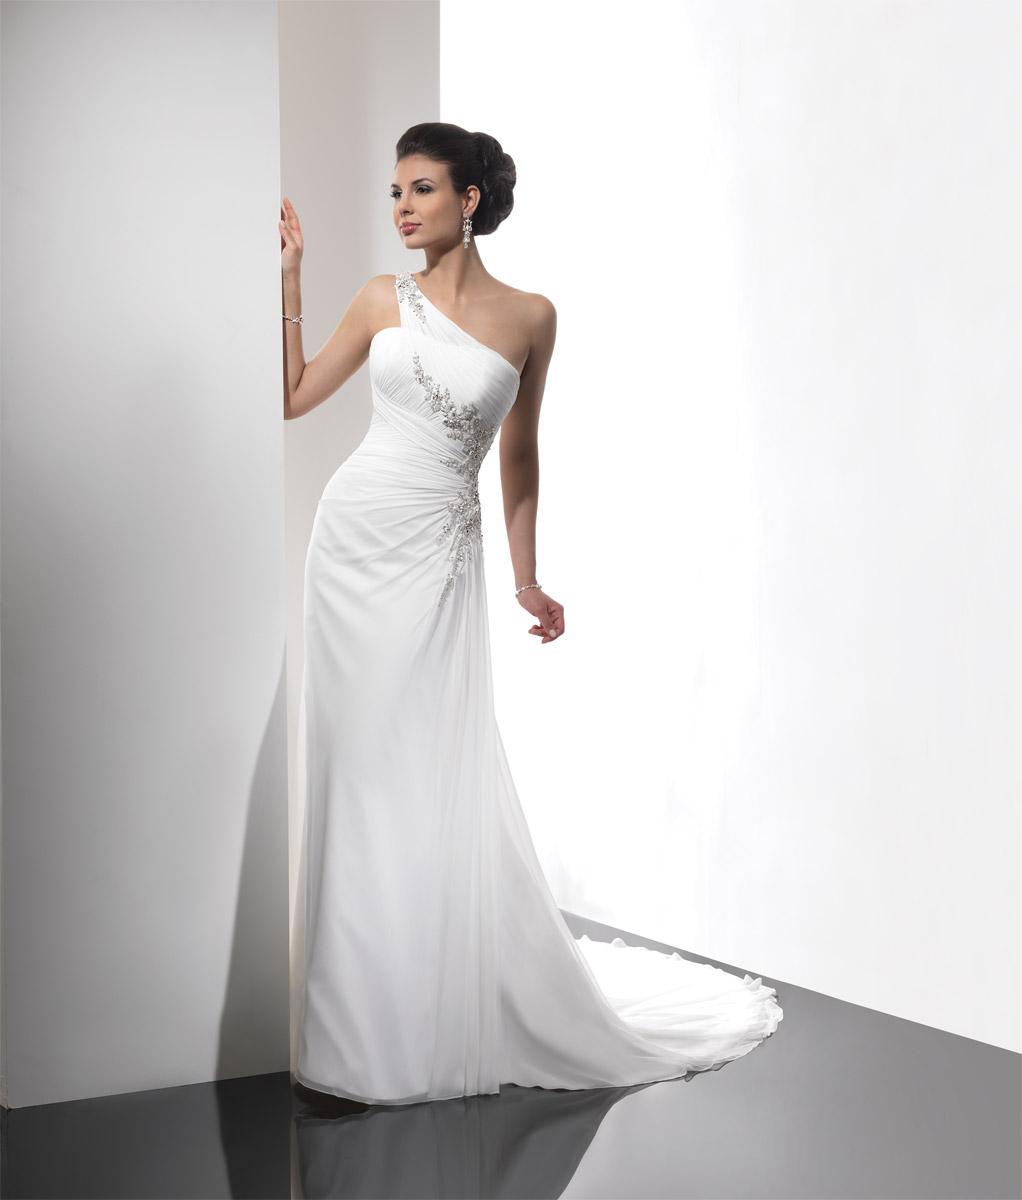 Winter Sale! Sample Wedding dresses for an absolute steal   Raffaele ...